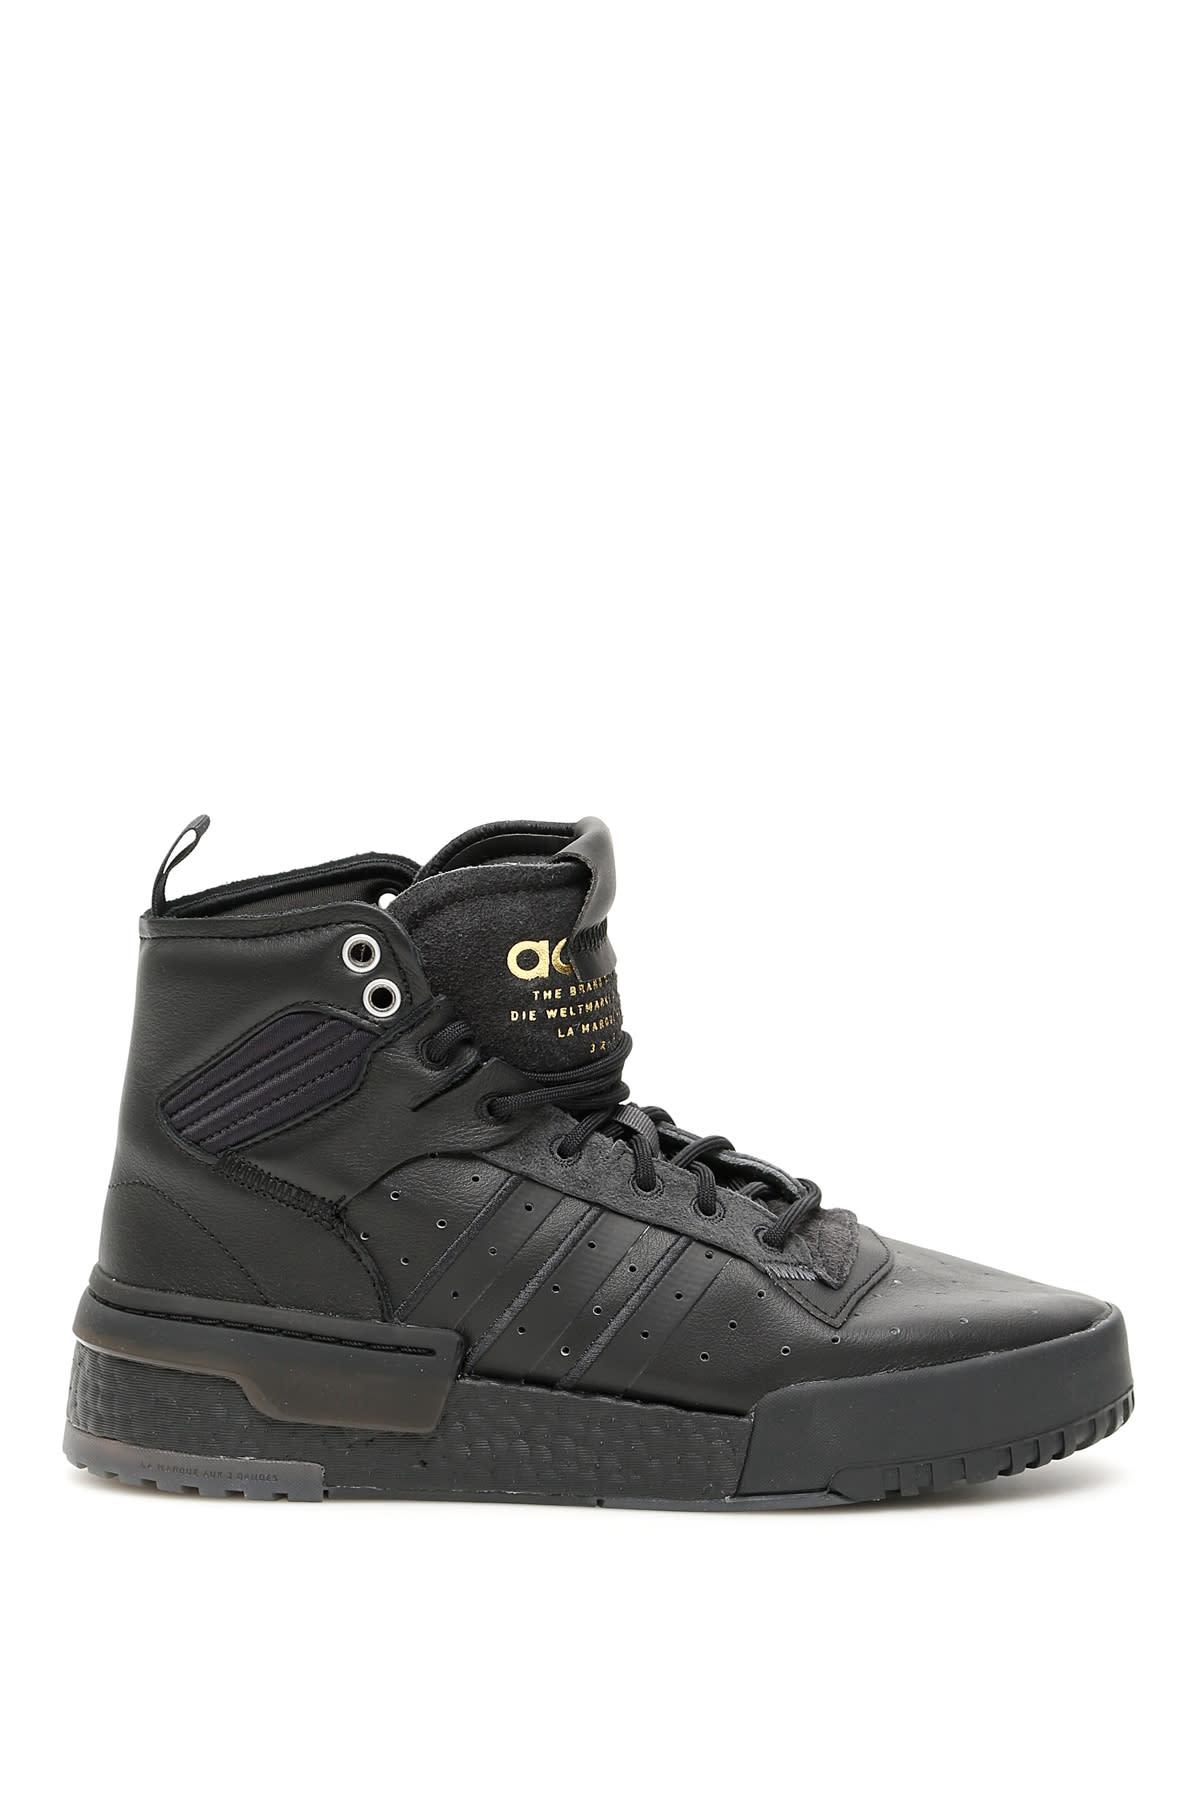 065ebbebec Adidas Rivalry Rm Hi-top Sneakers